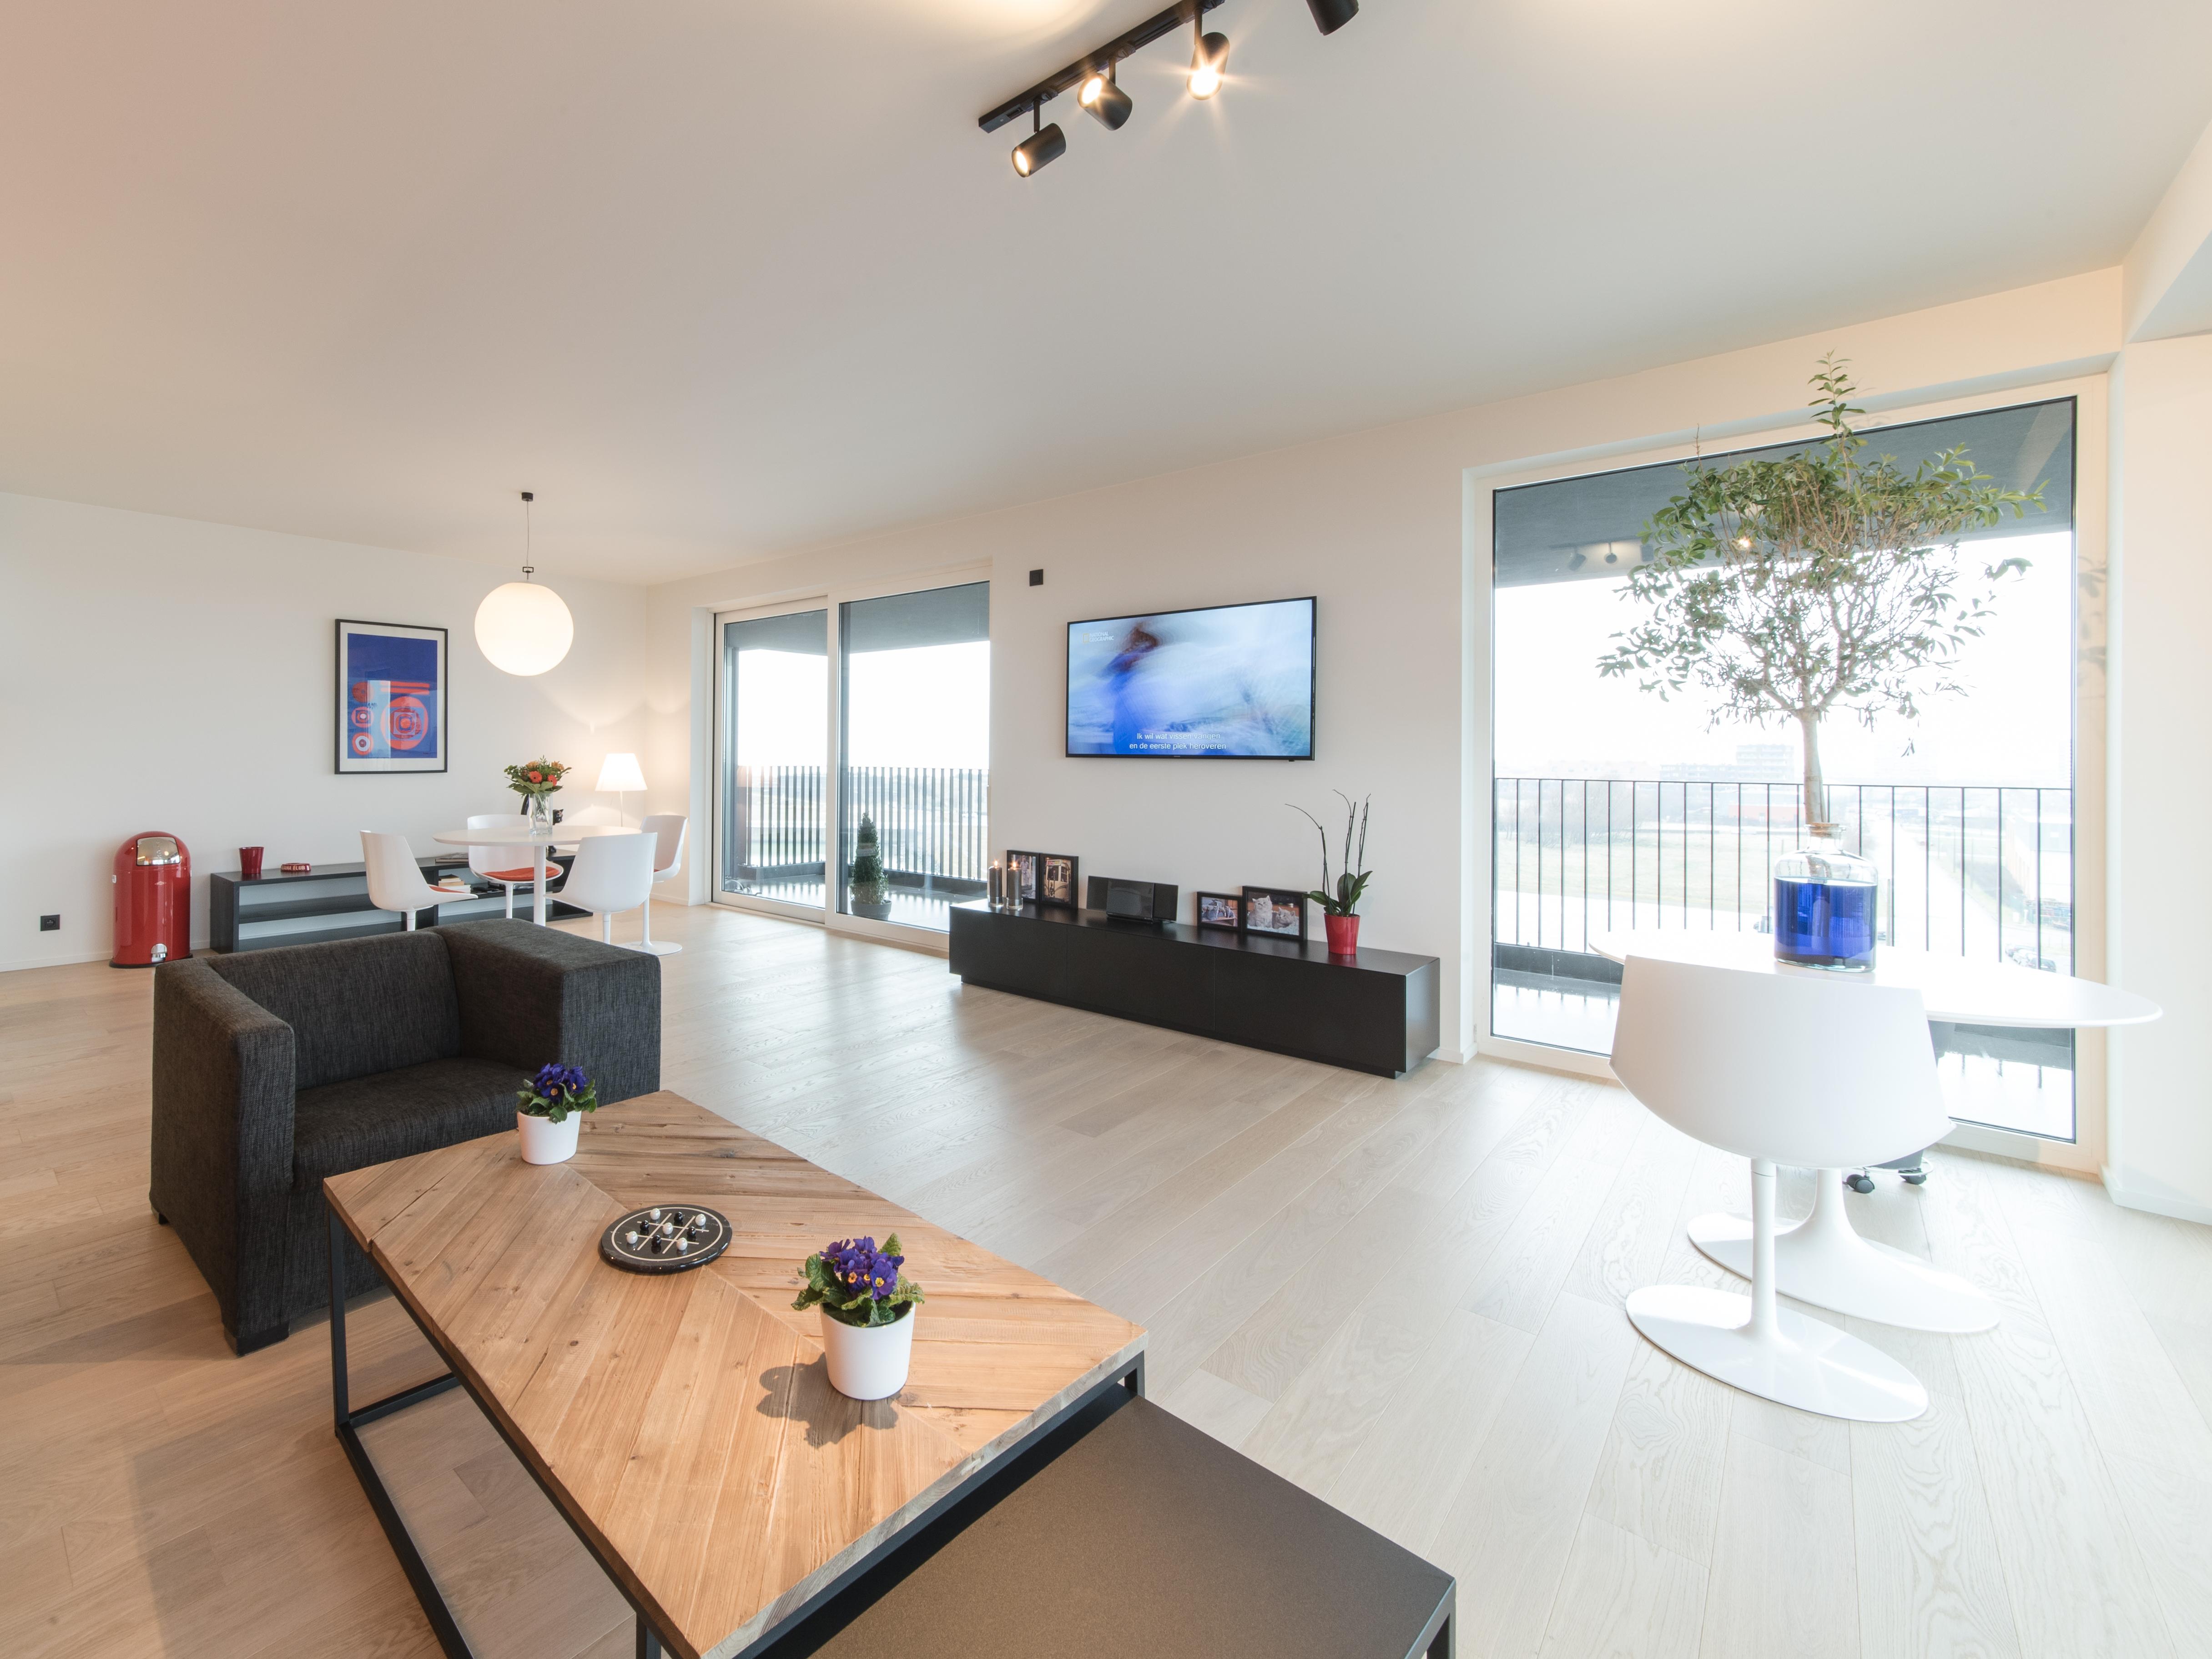 ferienwohnung victoria in oostende belgien interhome. Black Bedroom Furniture Sets. Home Design Ideas